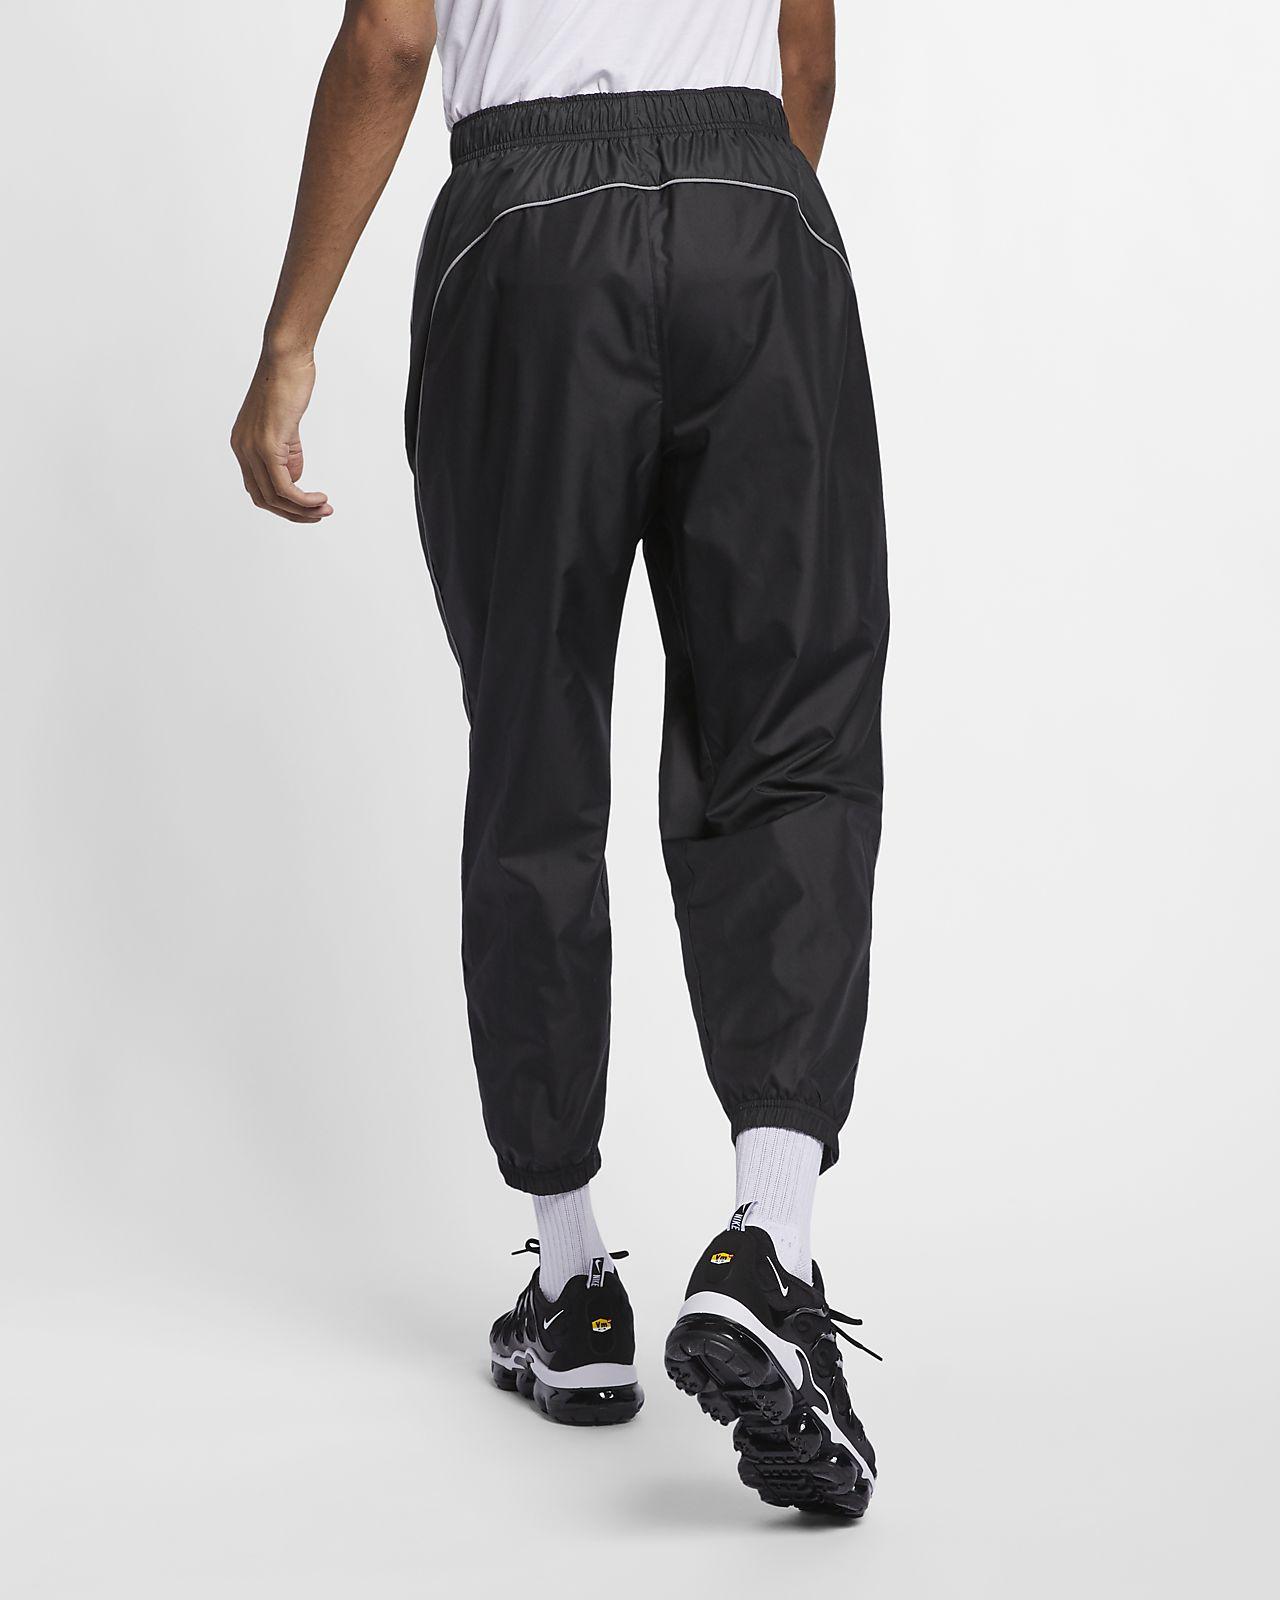 NikeLab Collection Tn Herren-Trackhose